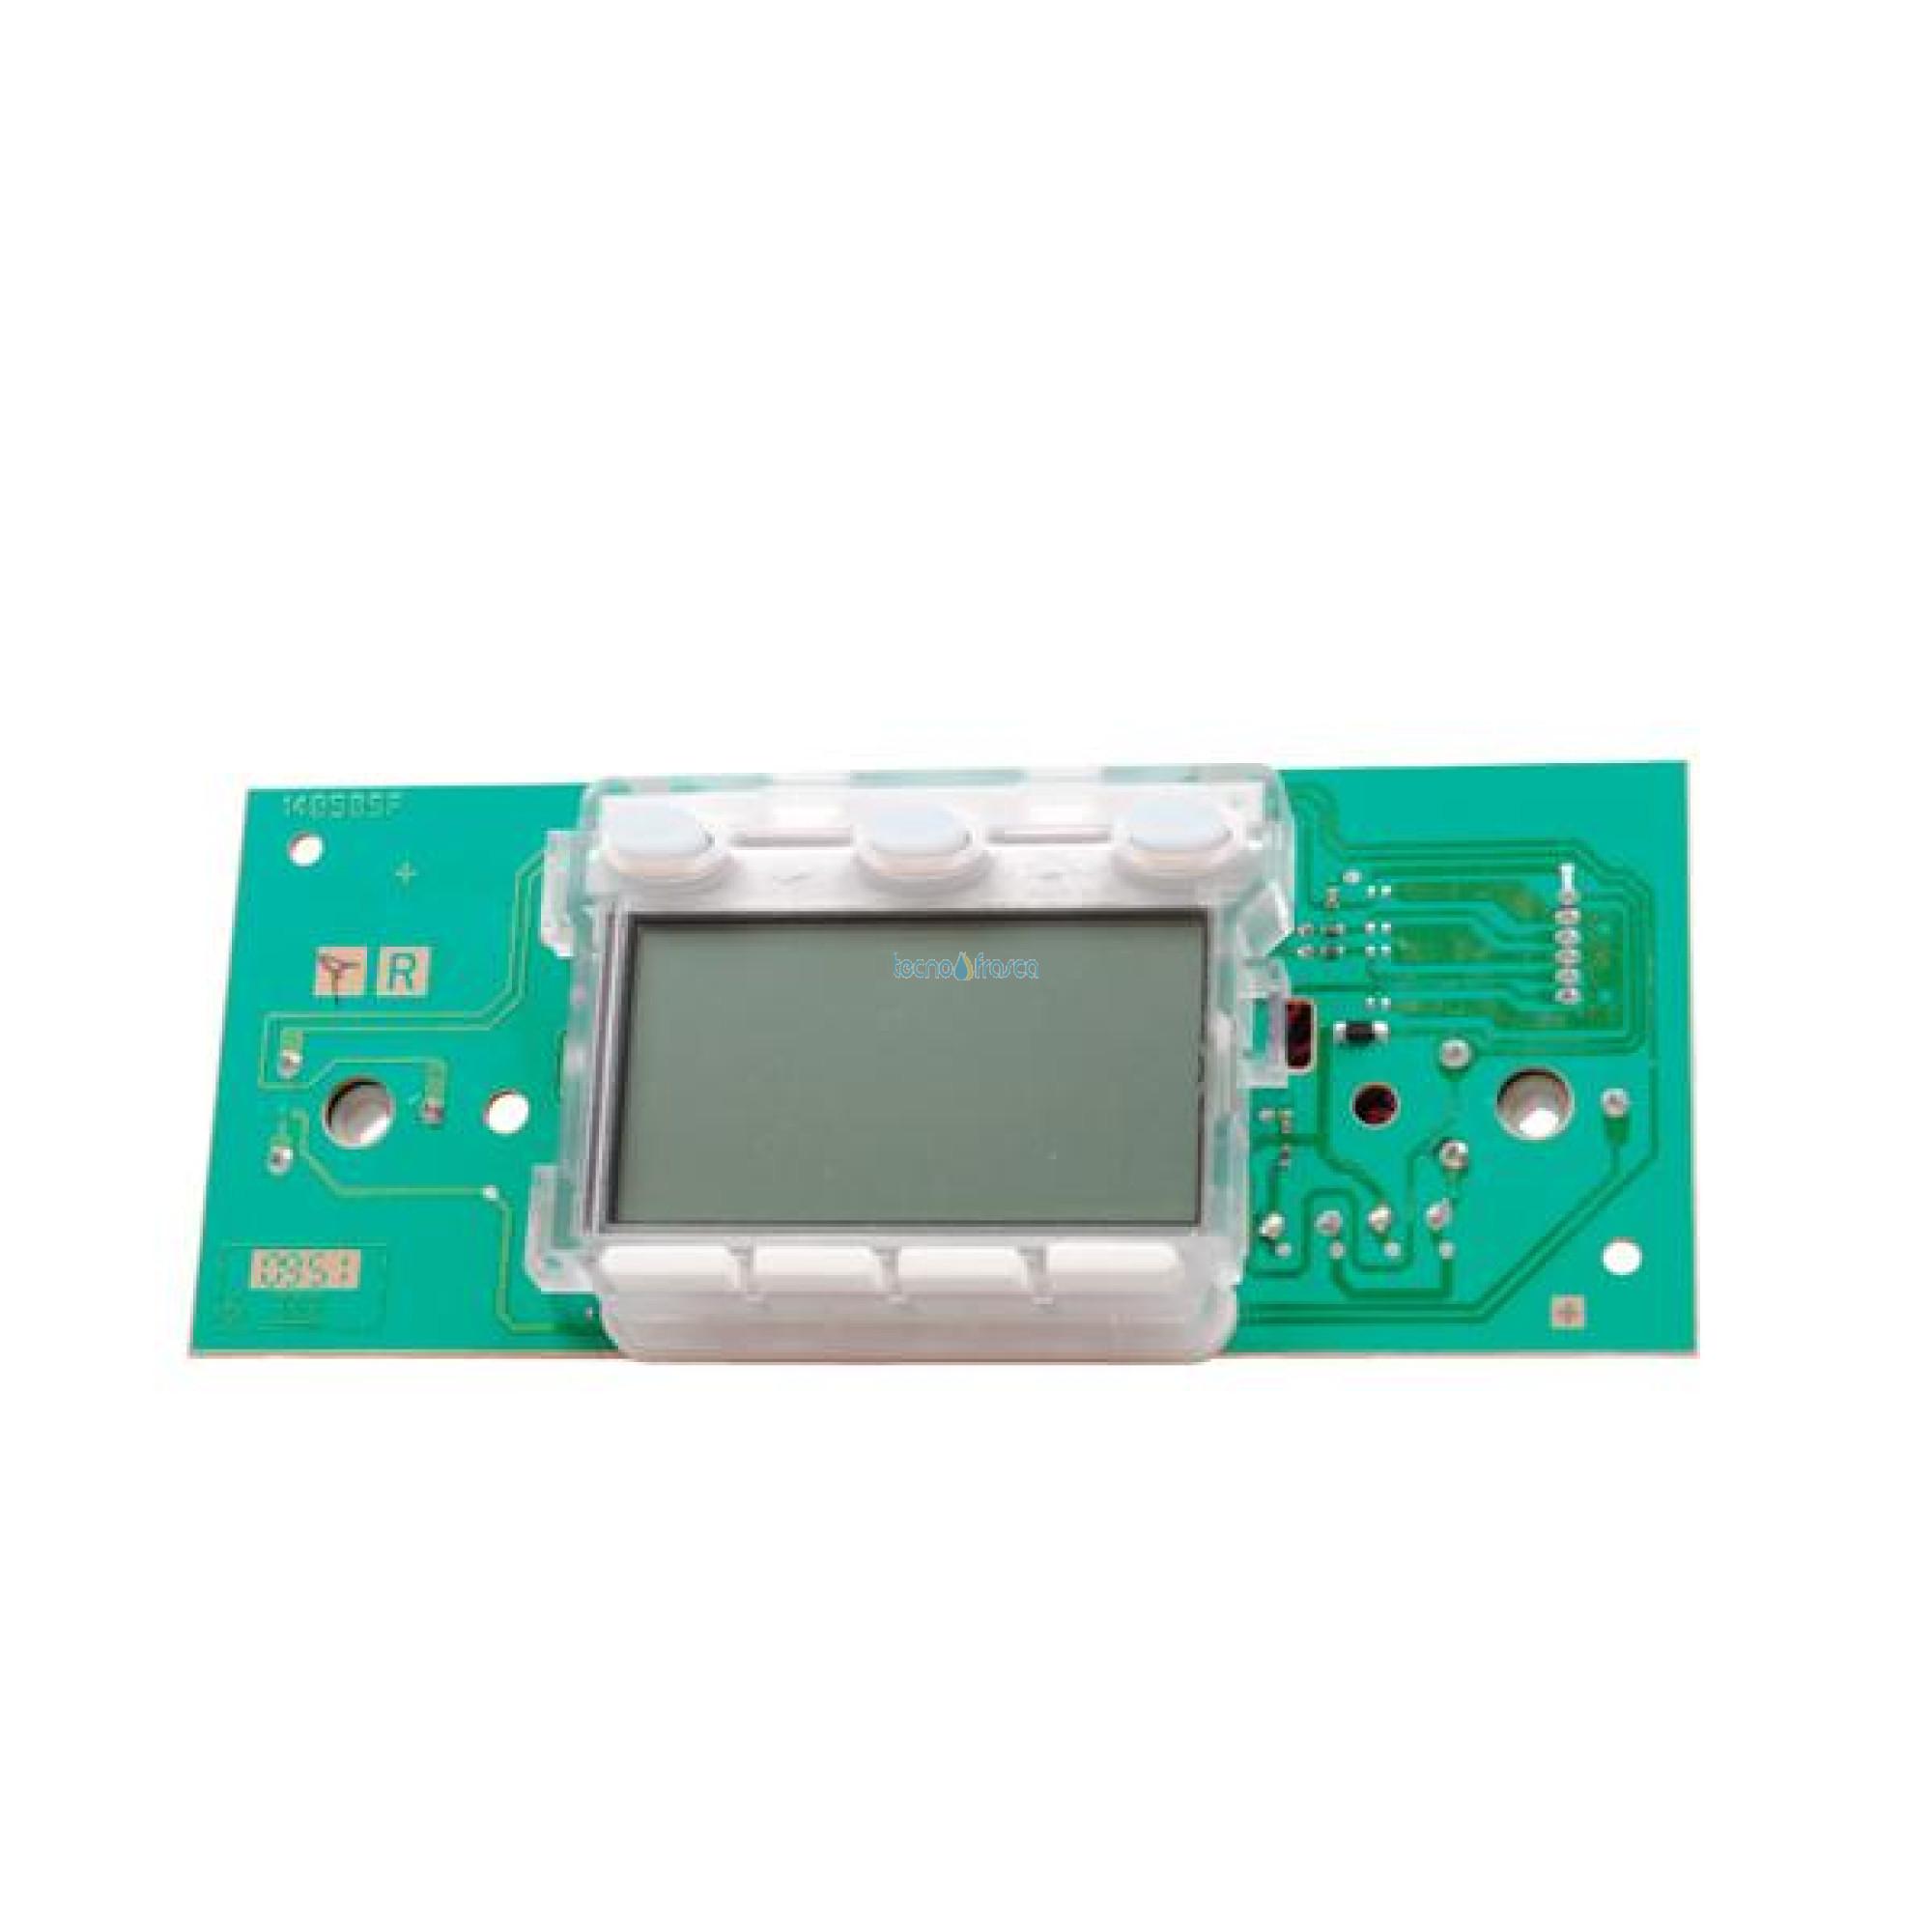 Chaffoteaux scheda display 60000486